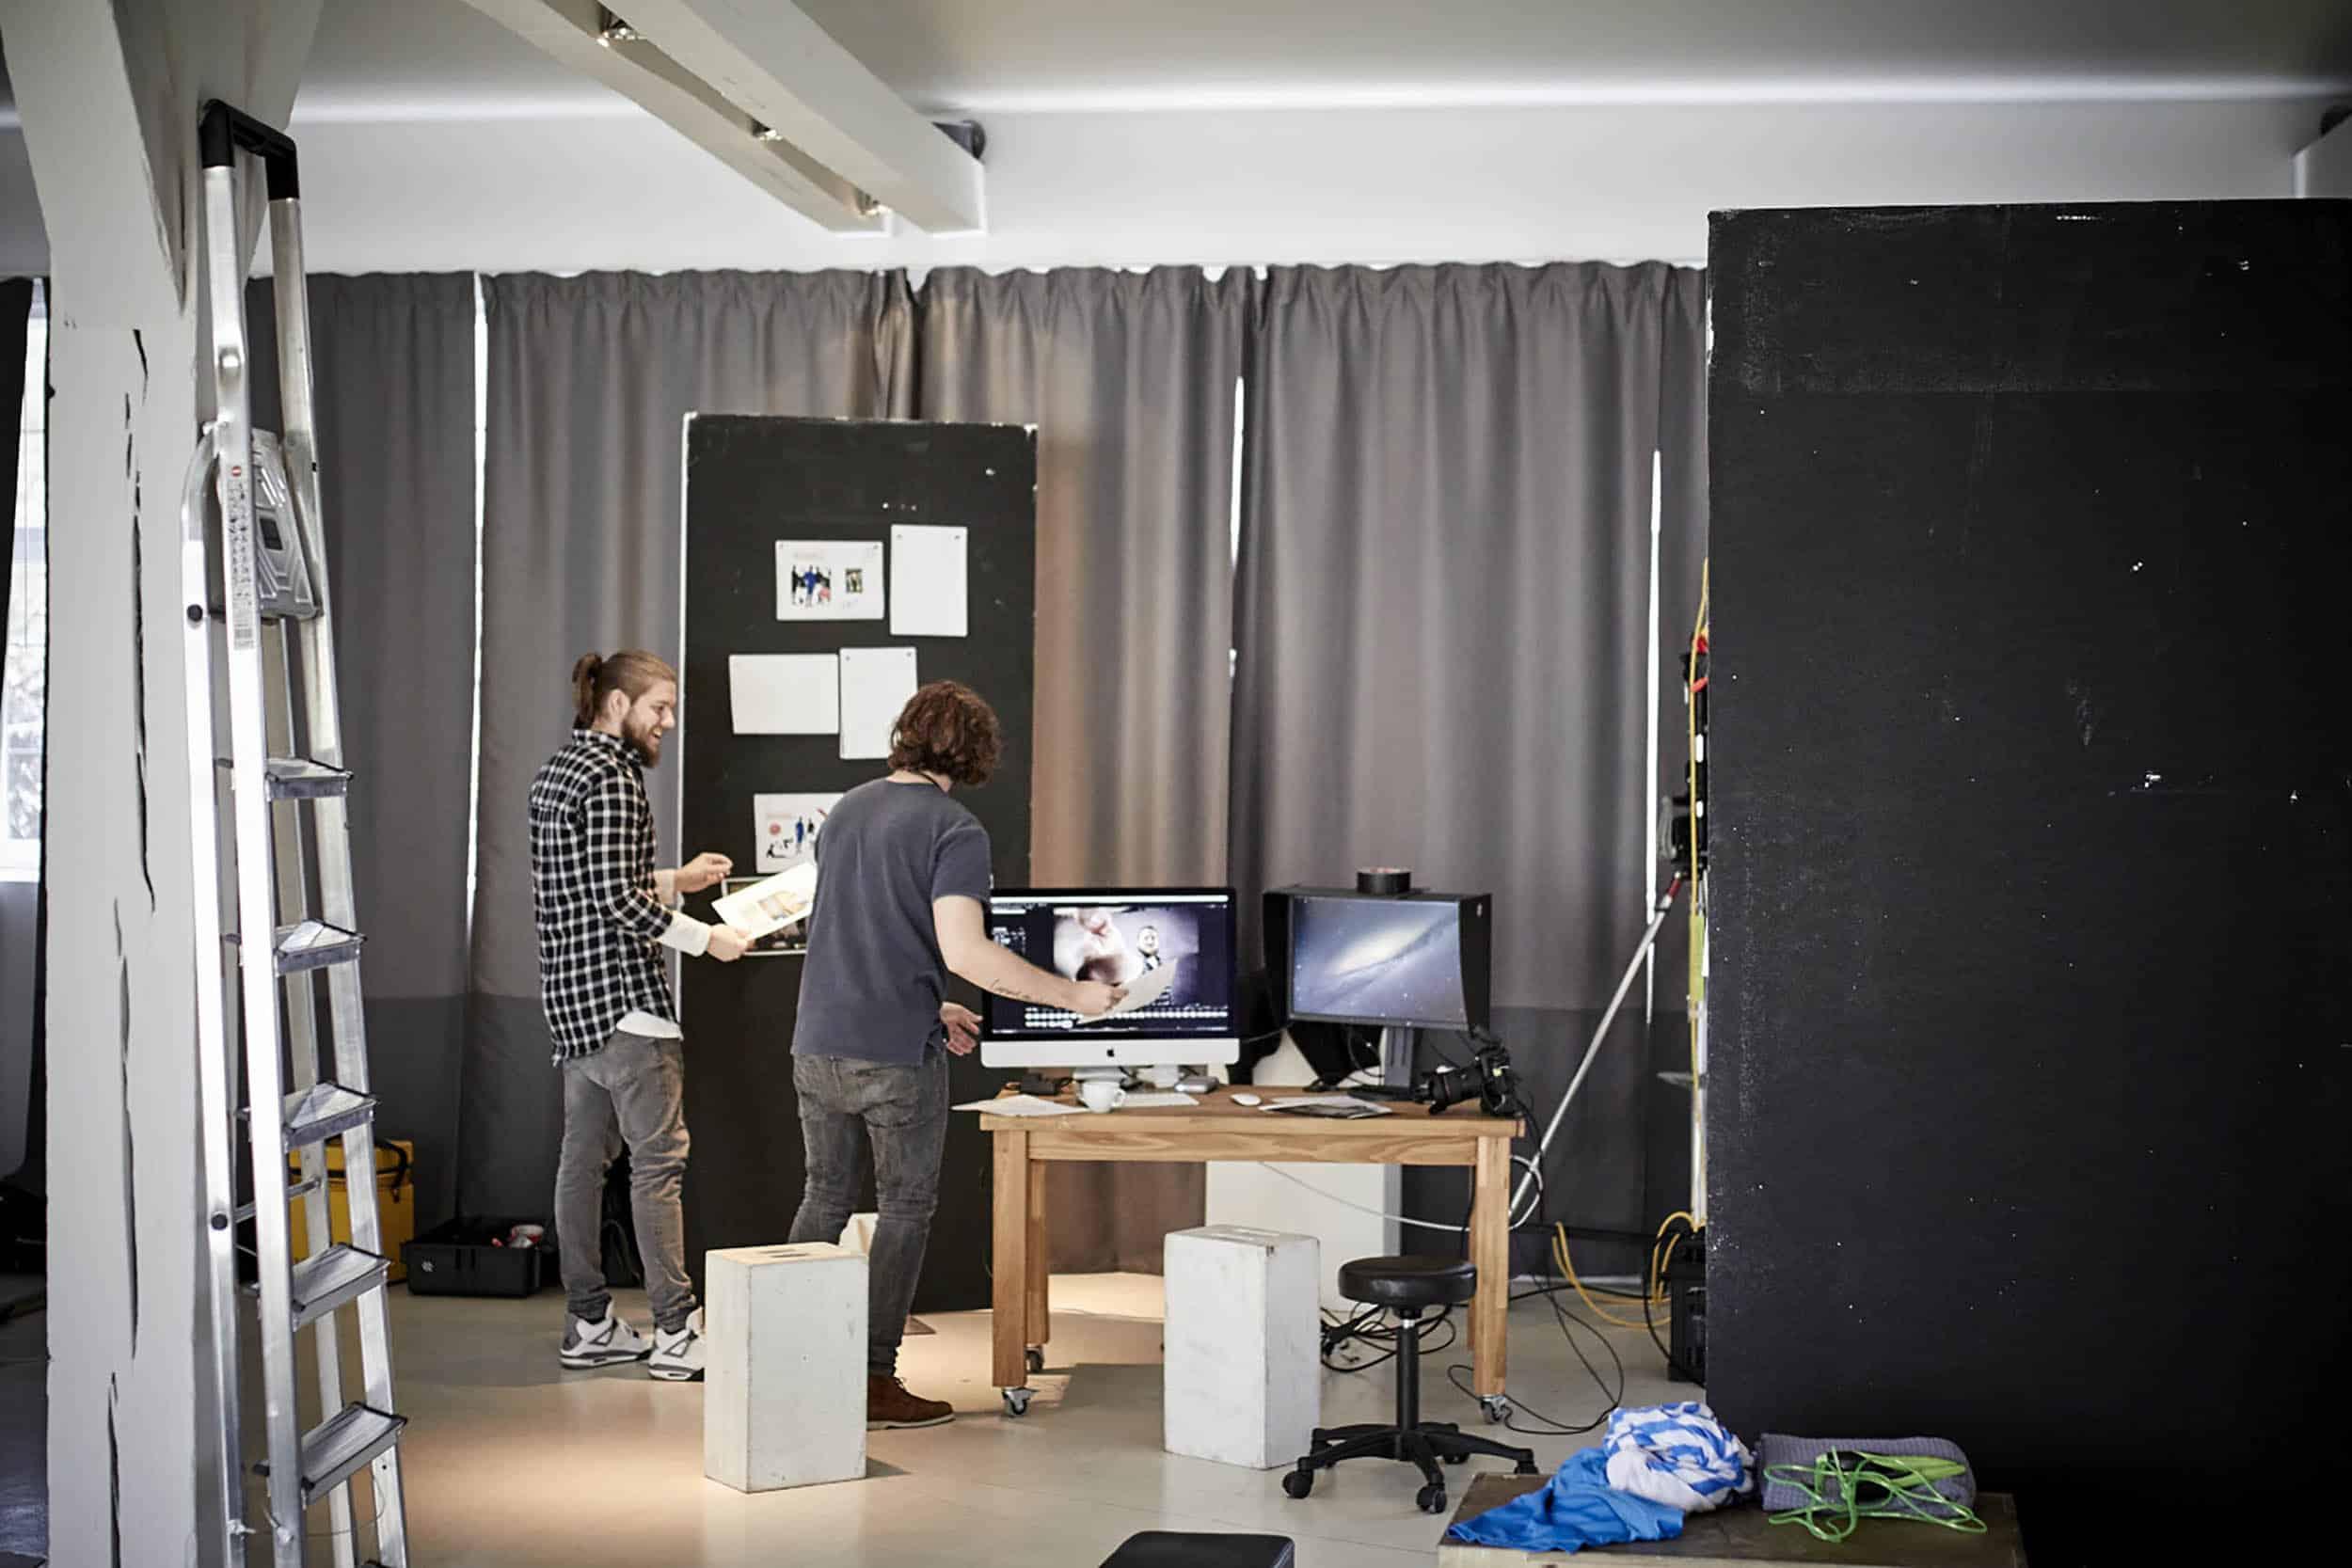 studio-ignatov-klitschko-warsteiner-imagekampagne-makingof-10